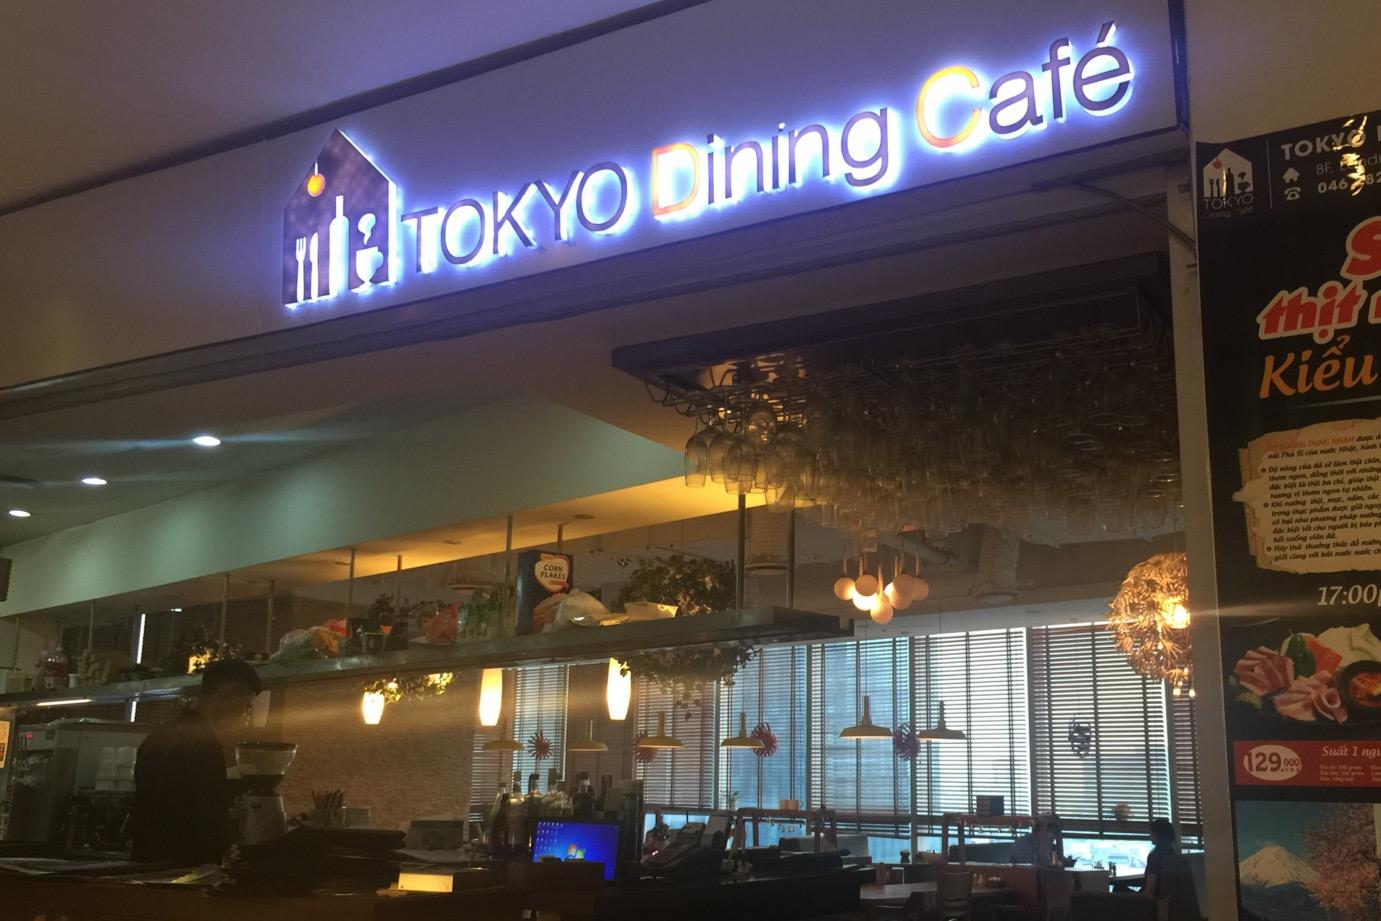 Tokyo Dining Cafe外観